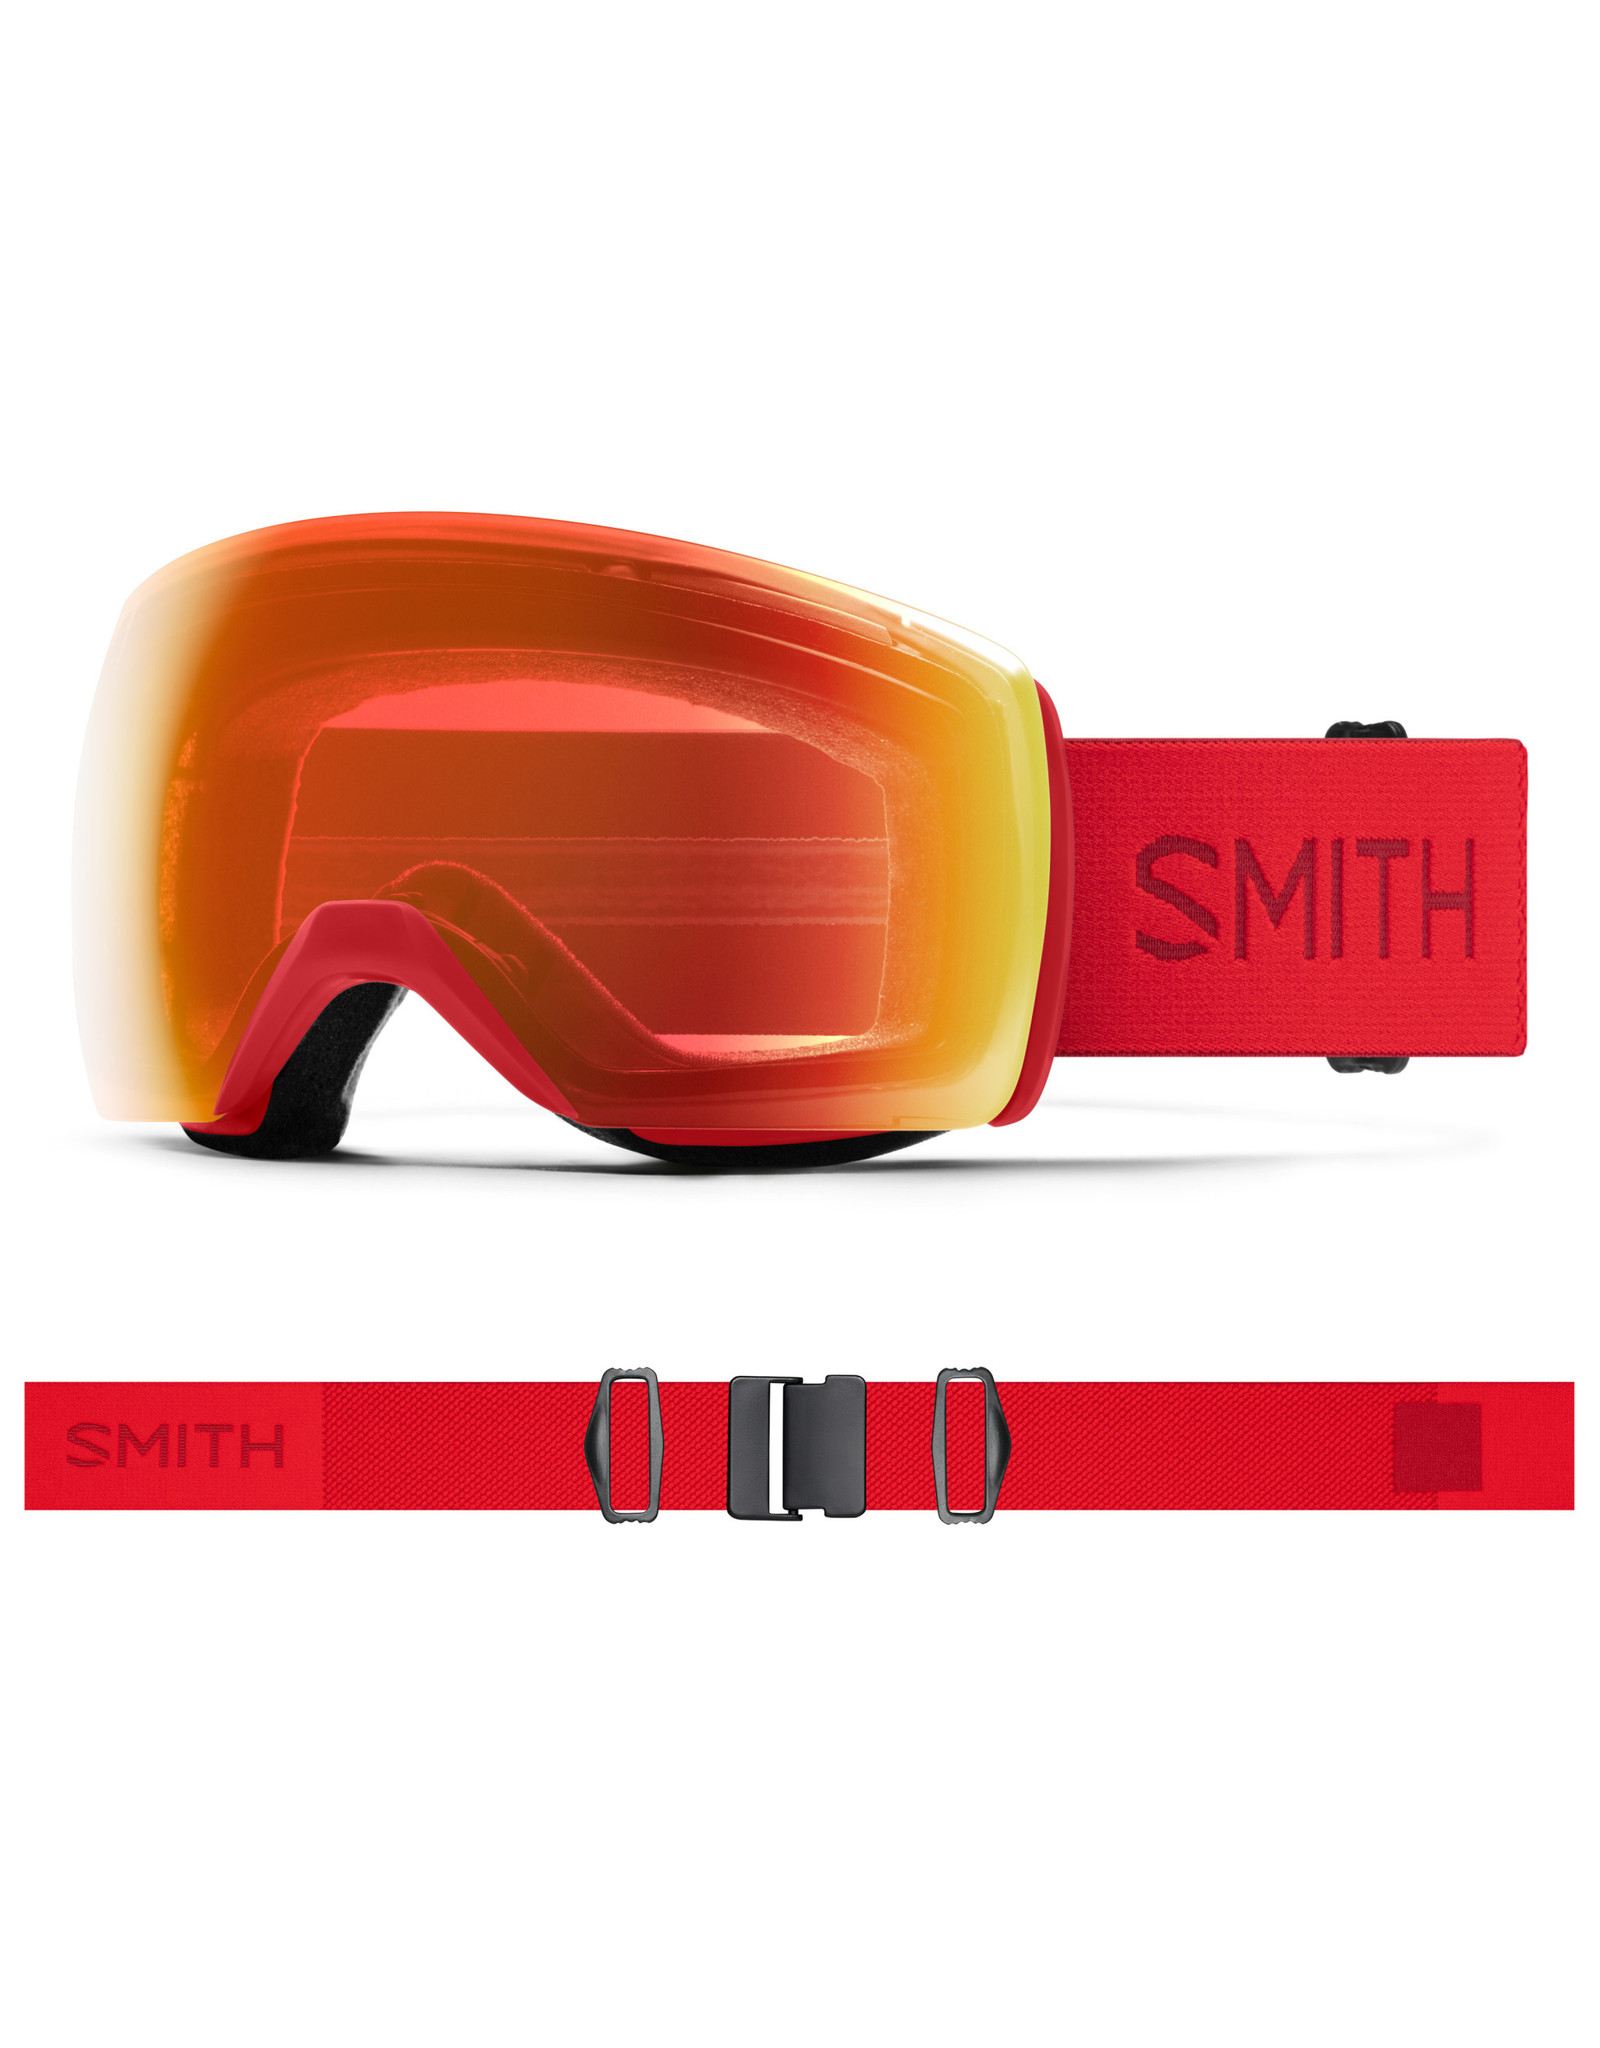 Smith SMITH SKYLINE XL LAVA 20 LUNETTES DE SKI